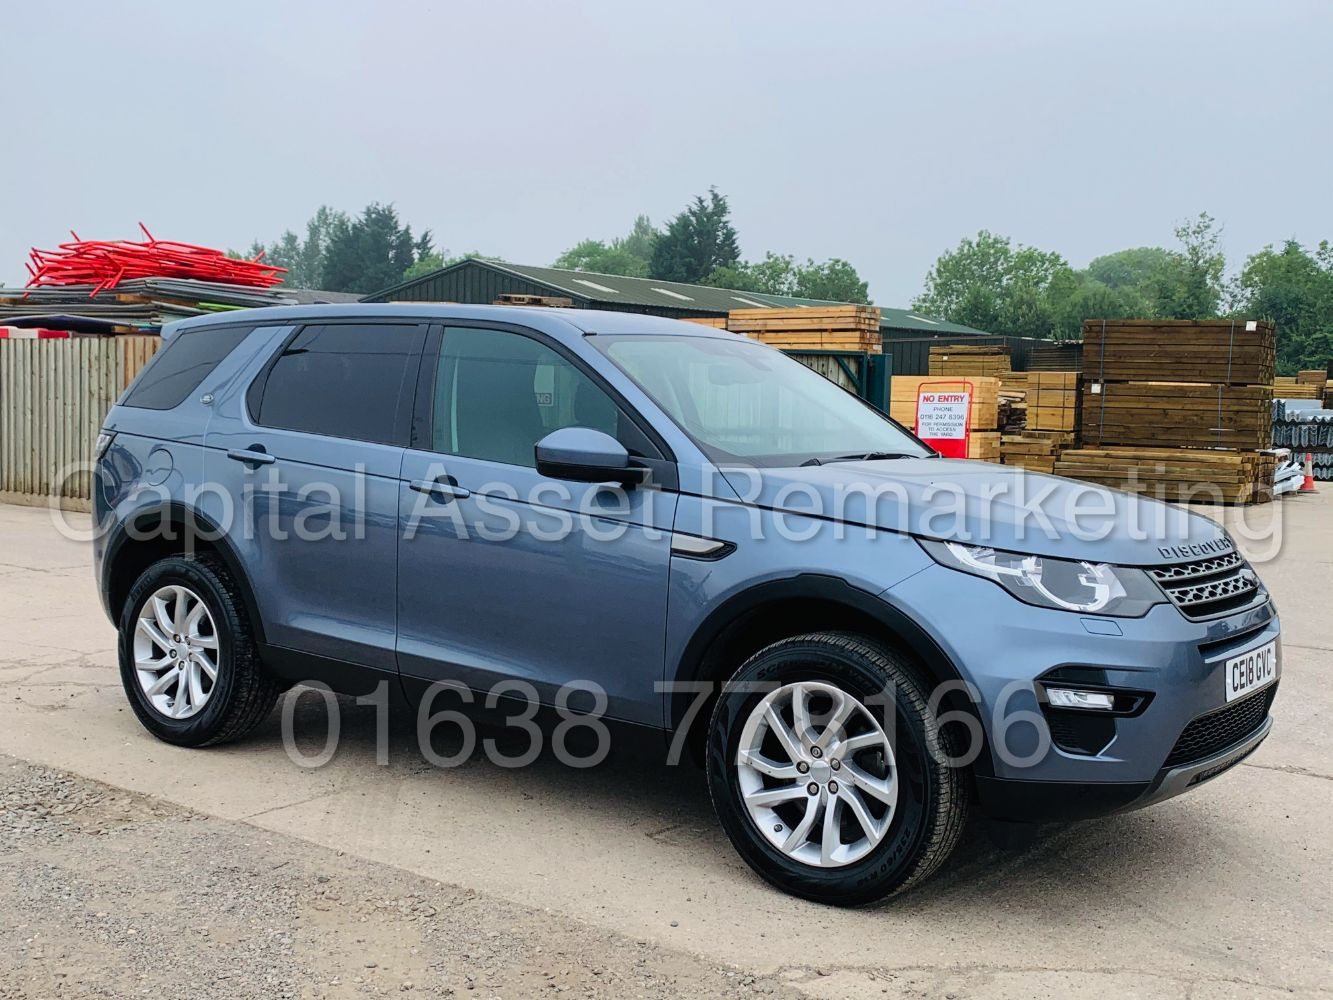 2018 Land Rover Discovery Sport *SE Tech* - 2018 Mercedes-Benz E220d *Saloon* - 2015 Mercedes-Benz ML350d *AMG Premium* + Many More Lots !!!